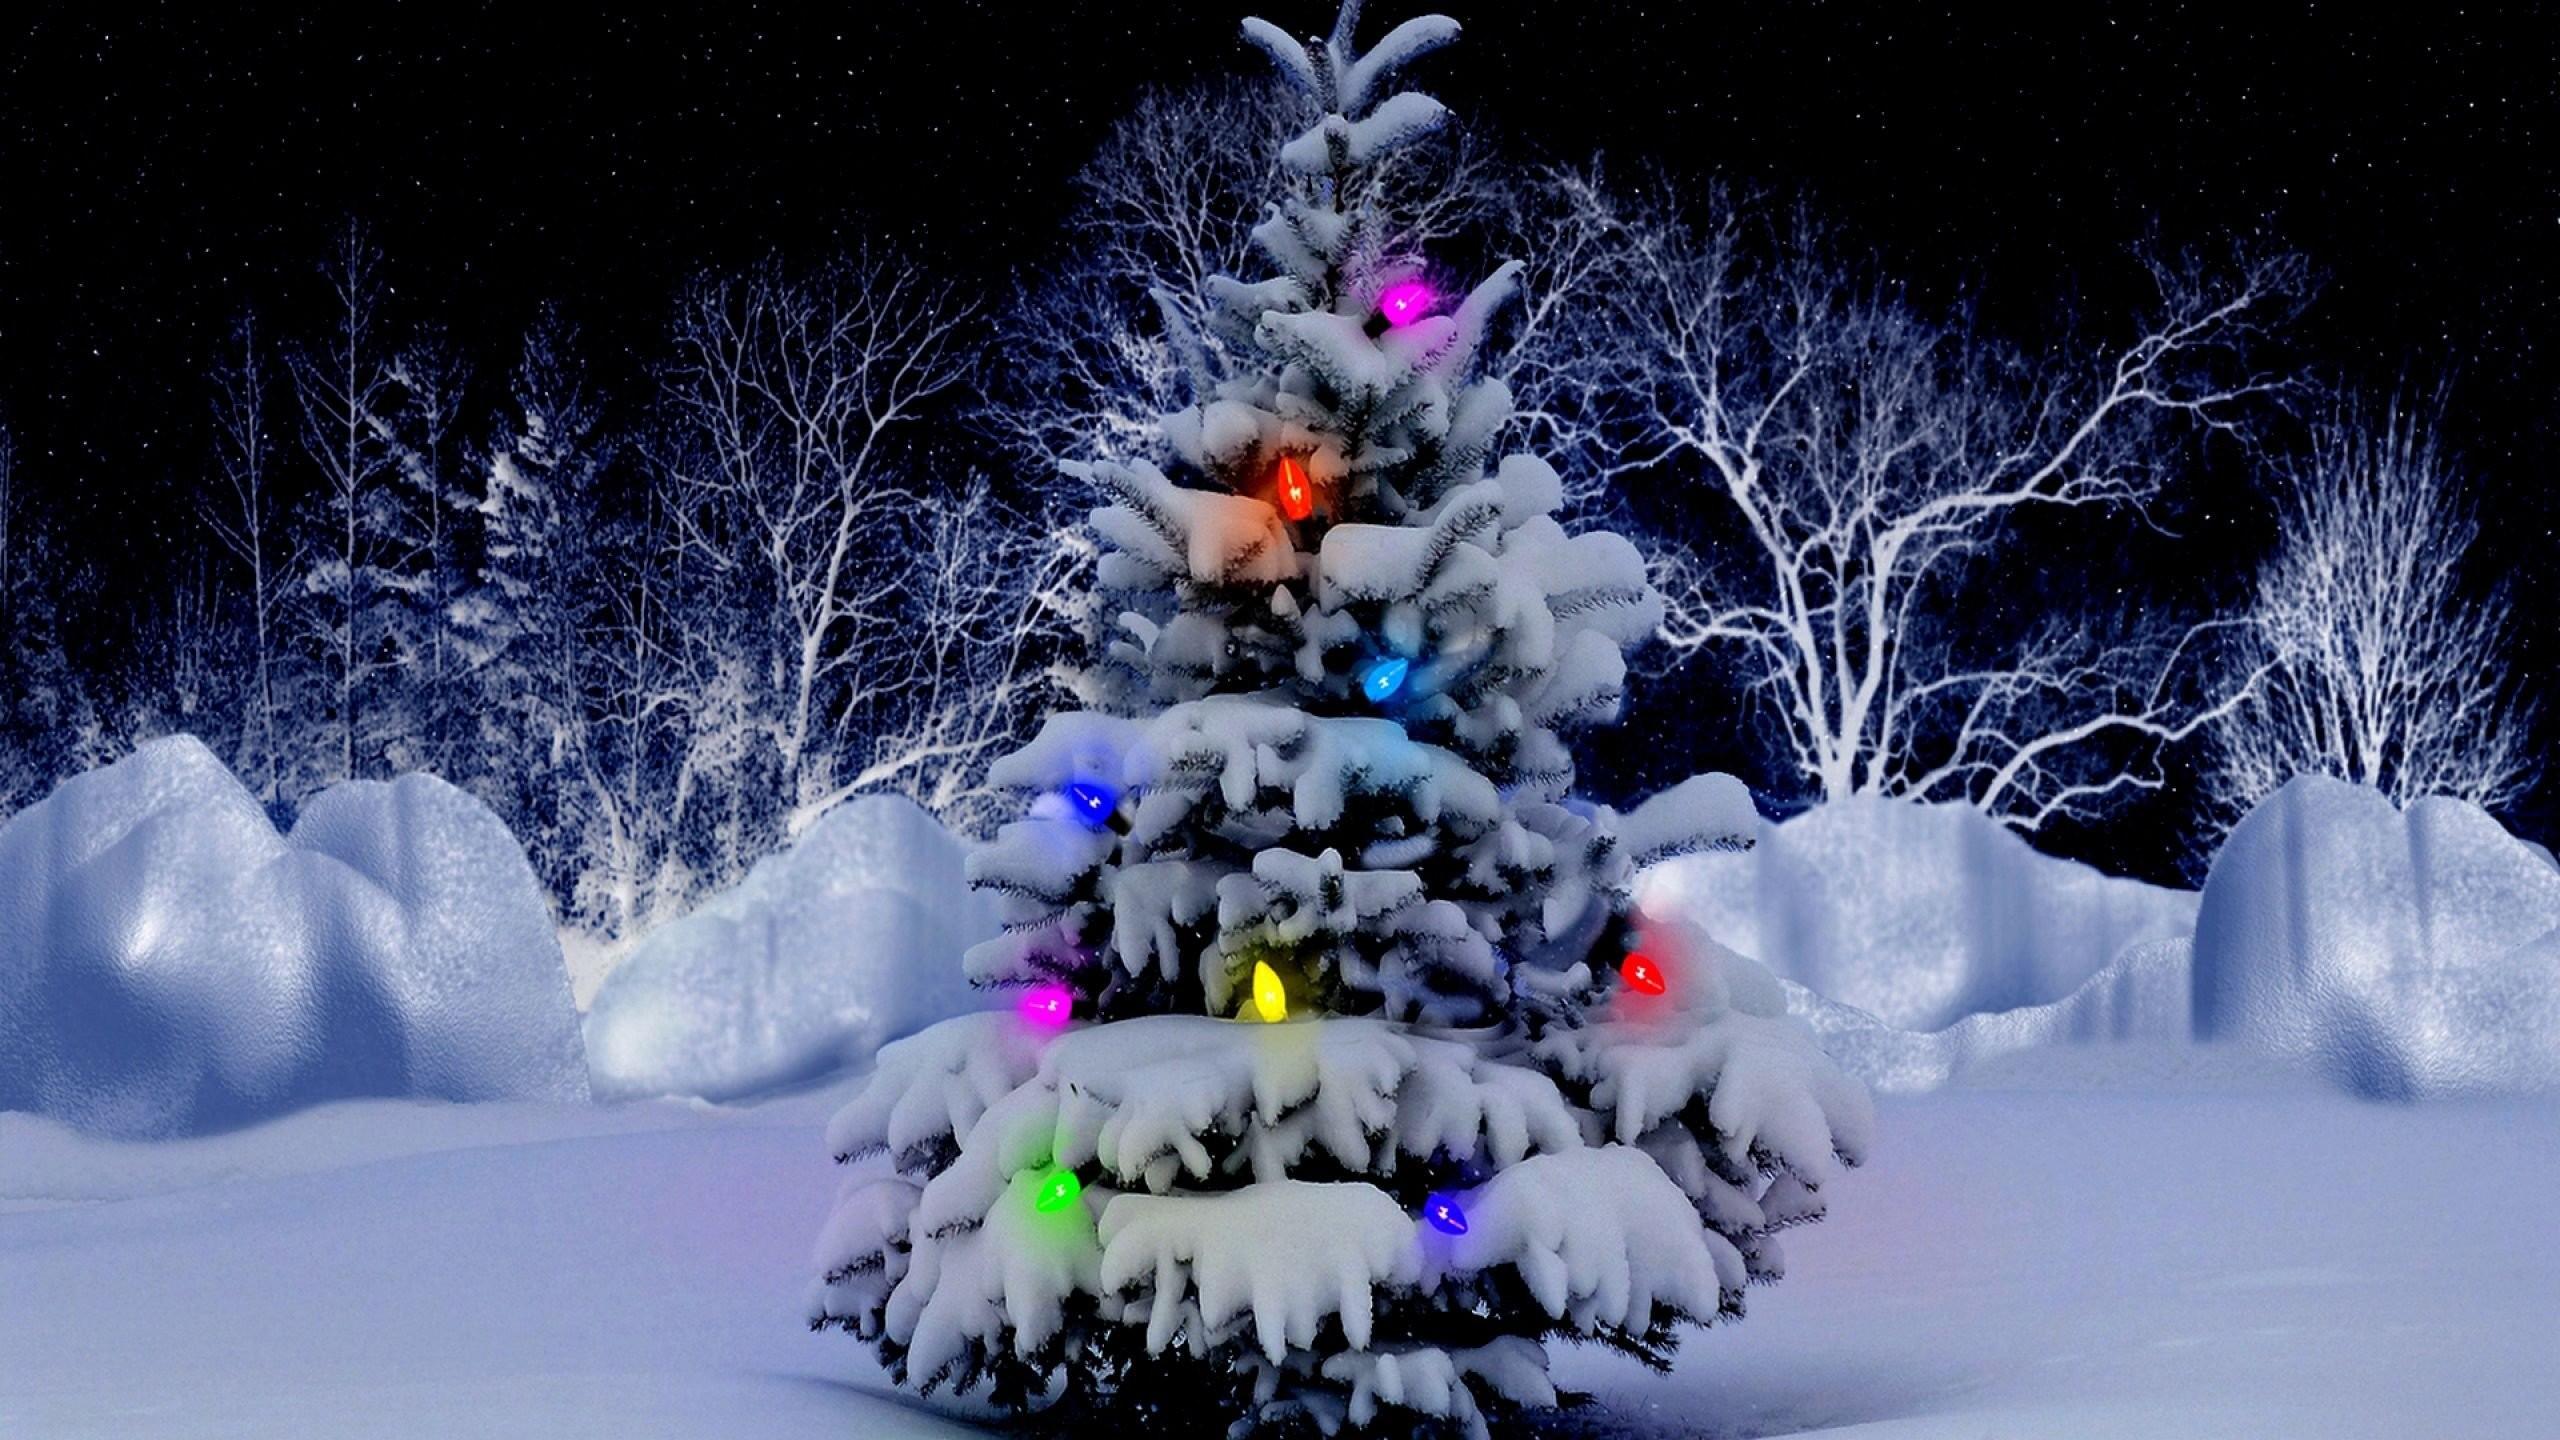 … wallpapers hd; christmas tree snow 532490 walldevil …